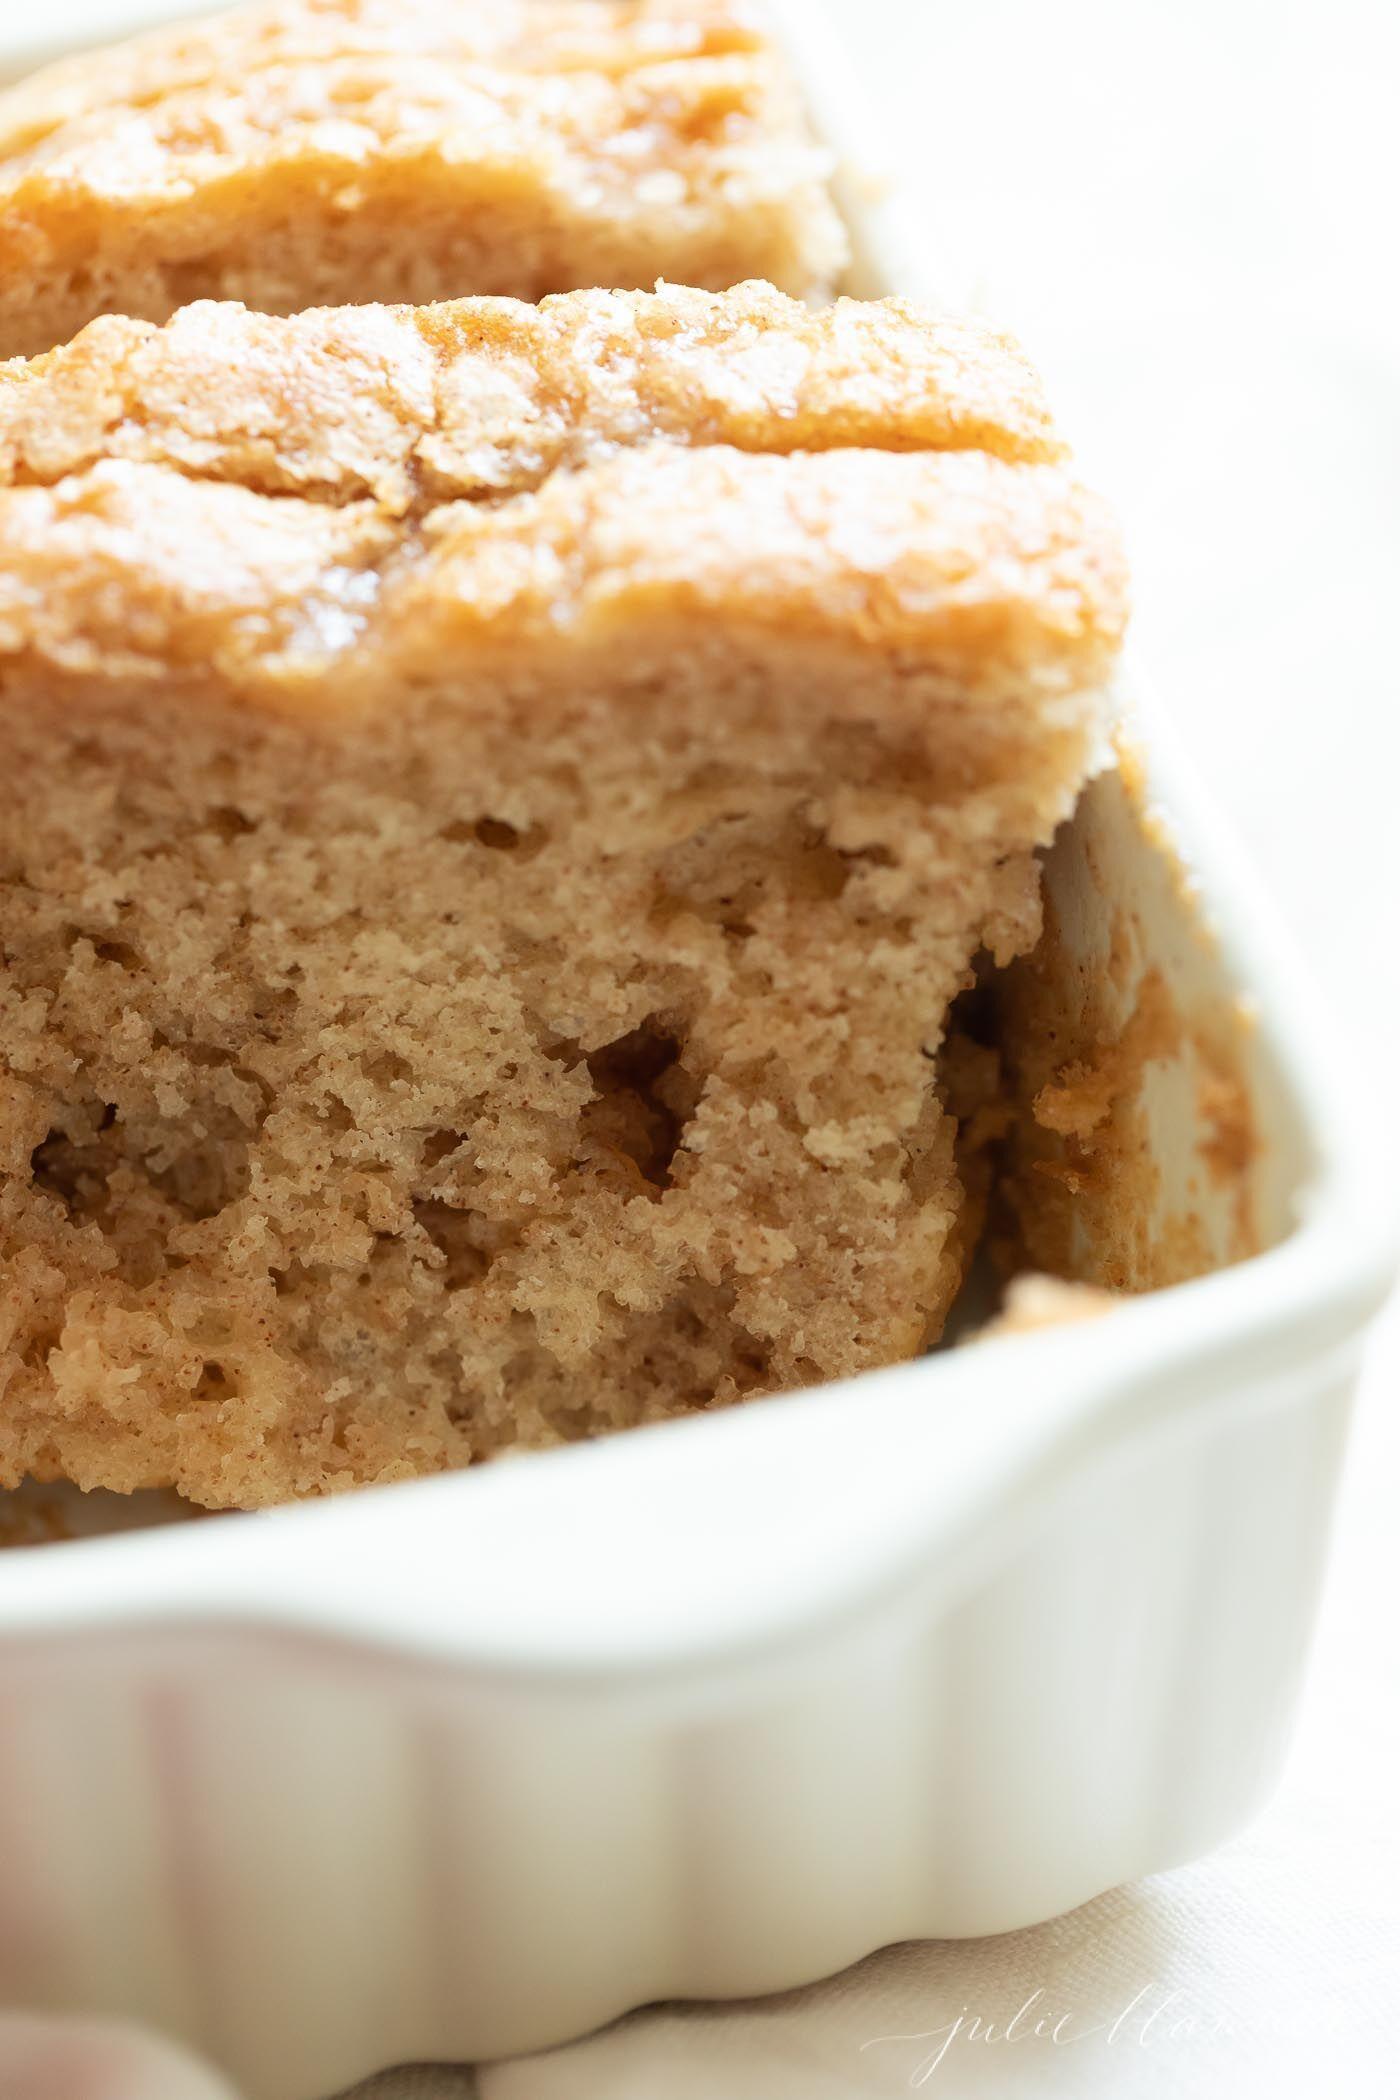 Amazing Apple Bread in Just 5 Minutes   Julie Blan